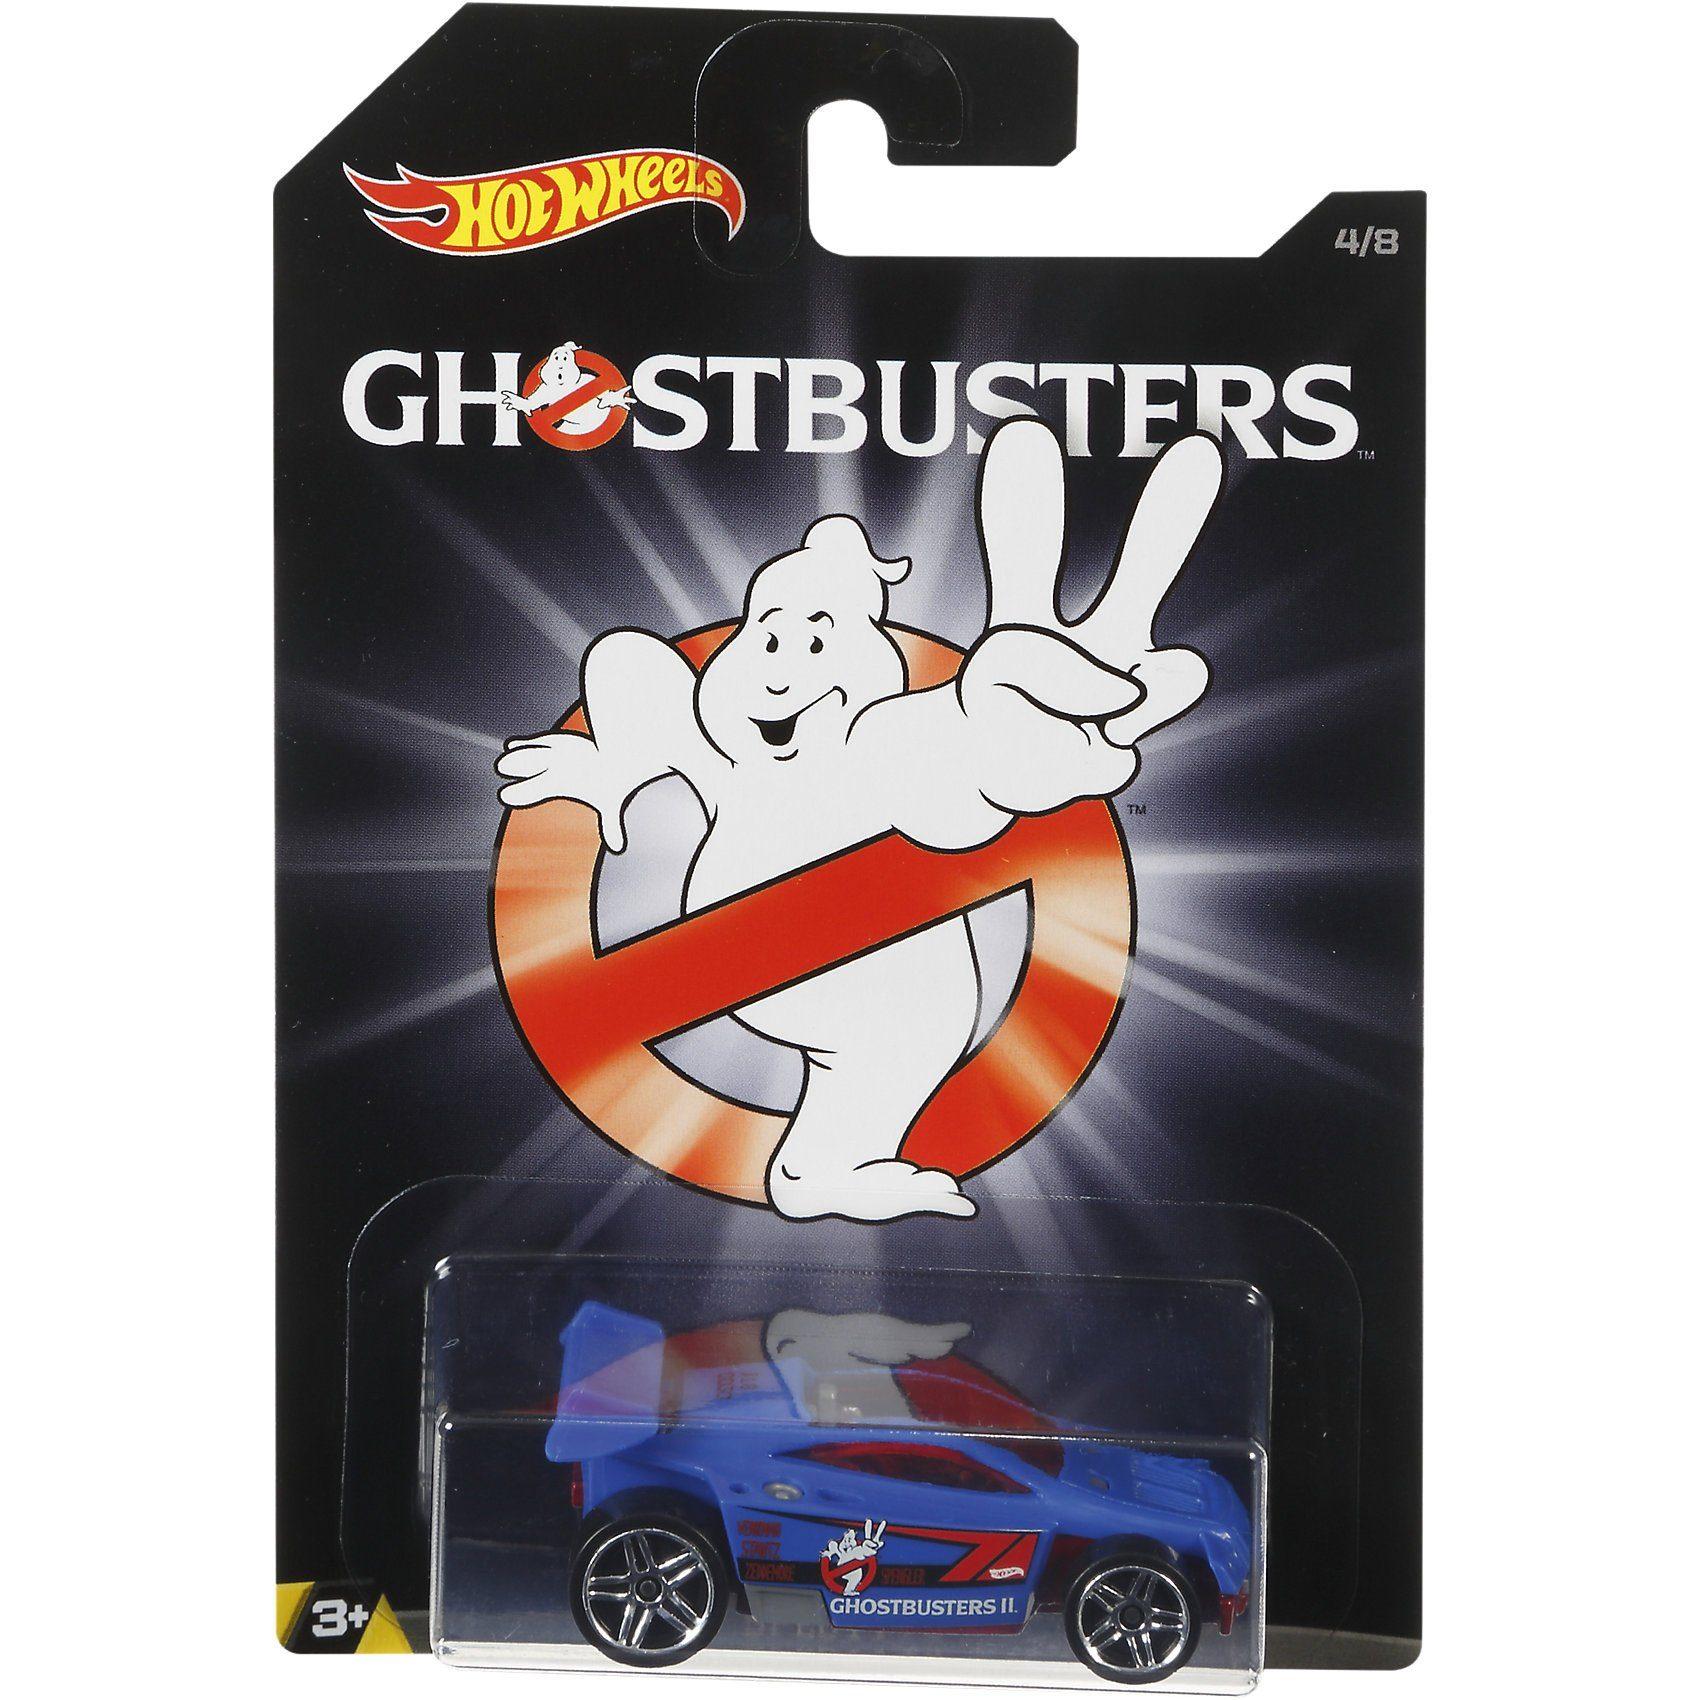 Mattel Hot Wheels Limited Car Ghostbusters 1 Fahrzeug